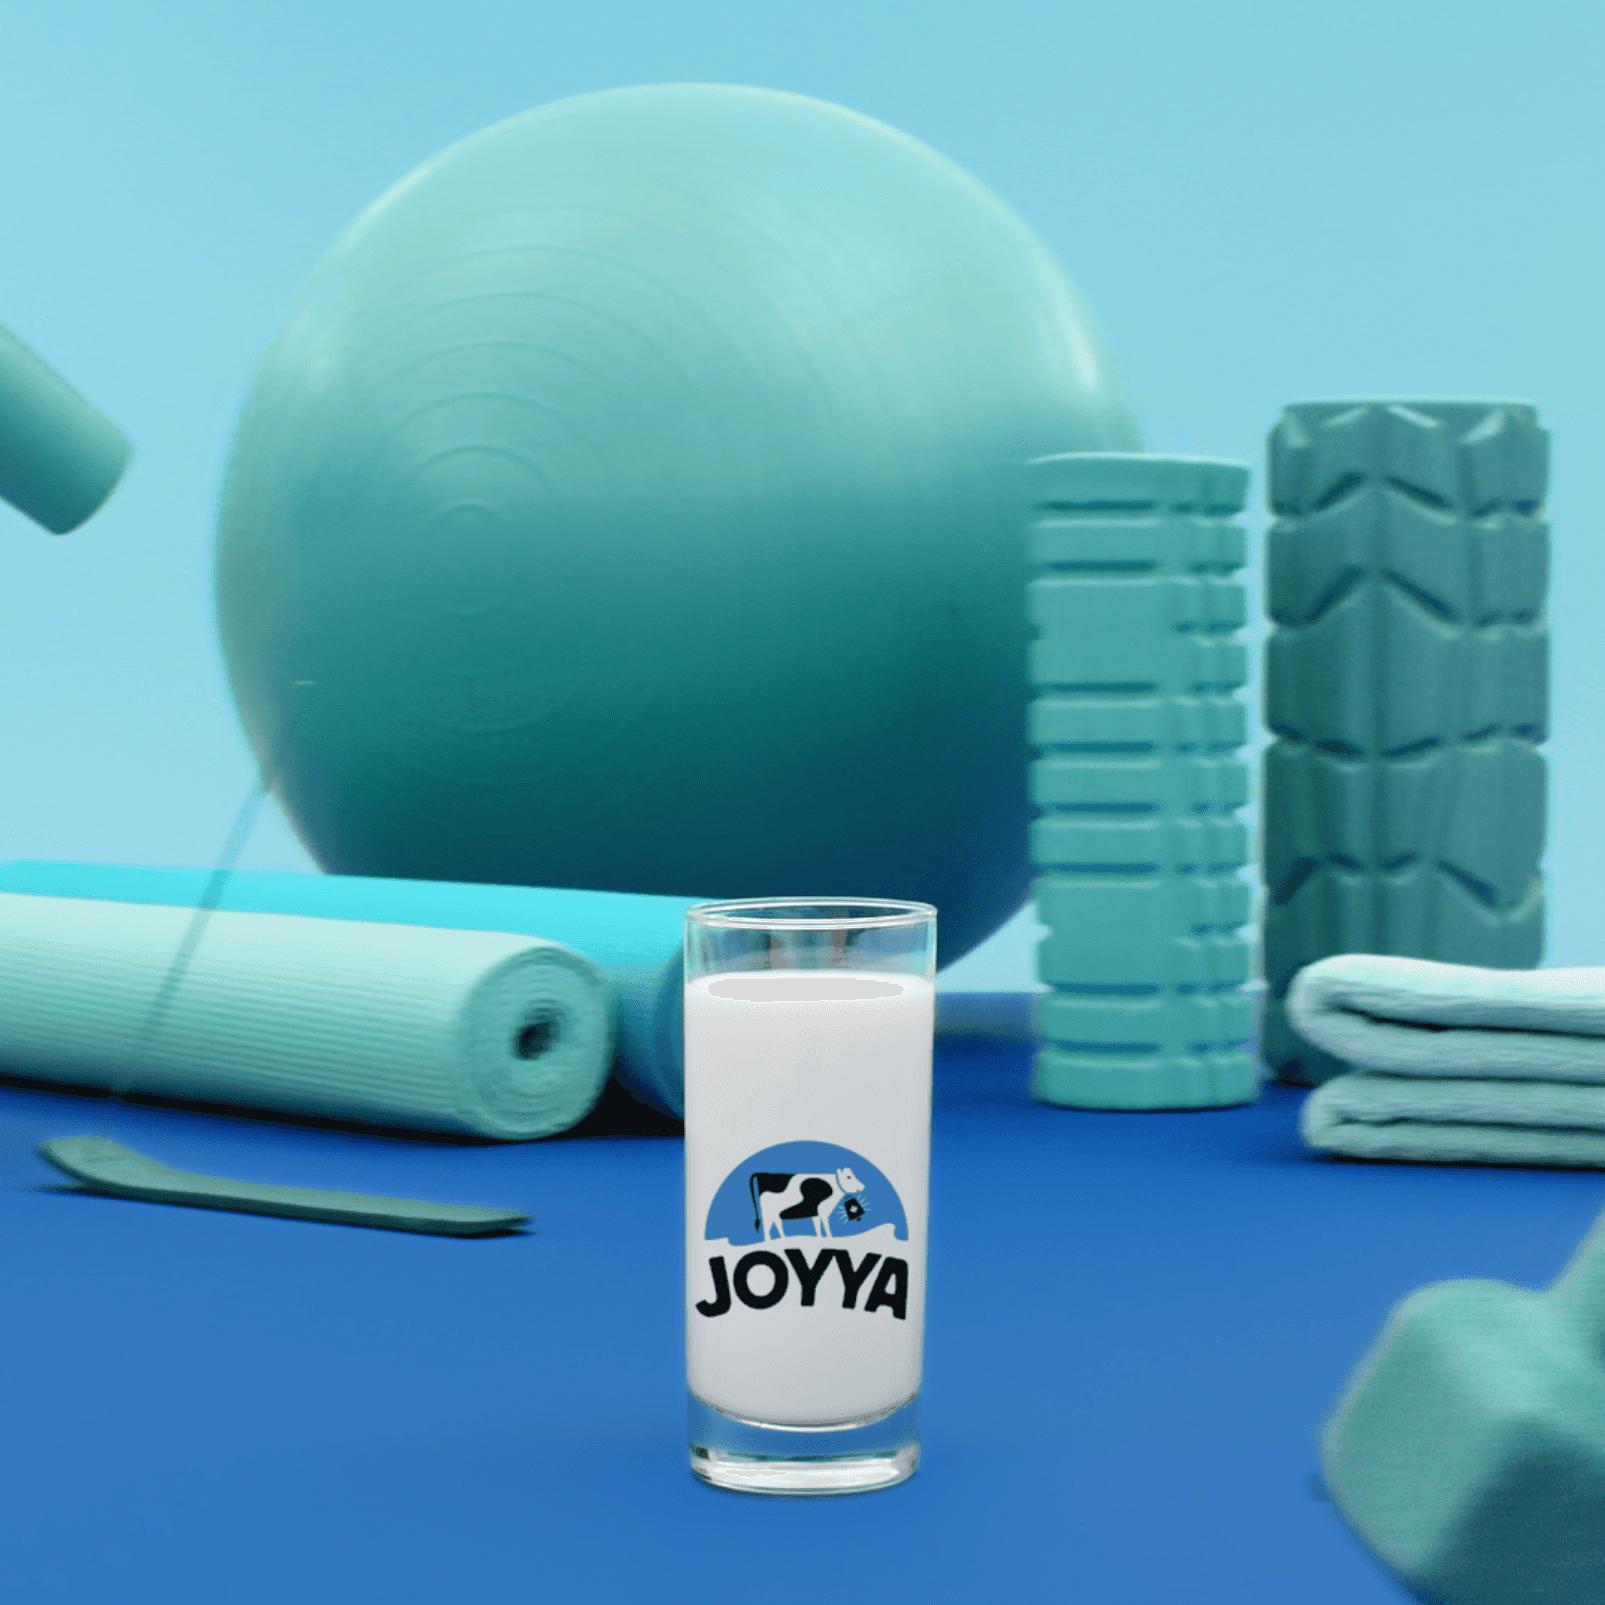 glass of Joyya proteined milk in front of yoga equipment by Simon Duhamel for Cossette